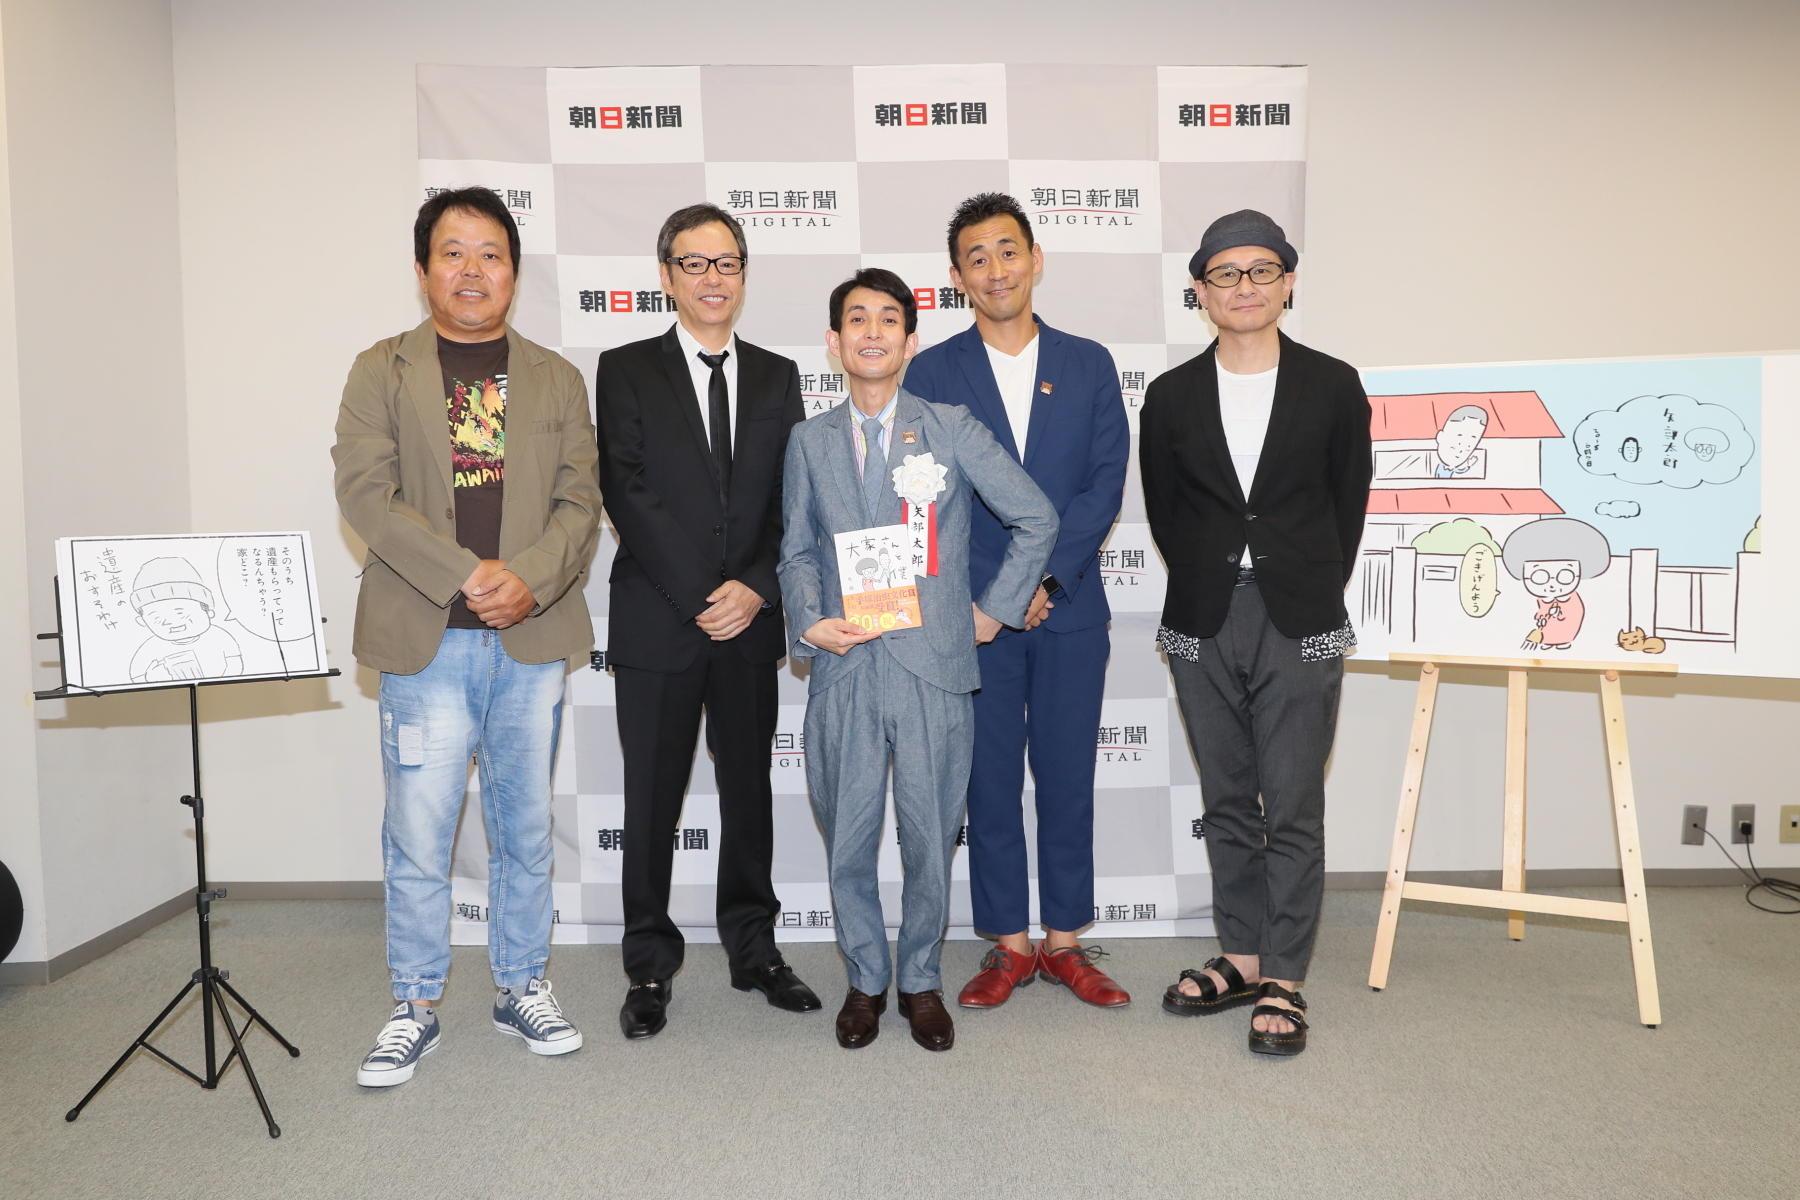 http://news.yoshimoto.co.jp/20180608001733-a04c02561bd35f587978840f86c1d6e4d0581369.jpg